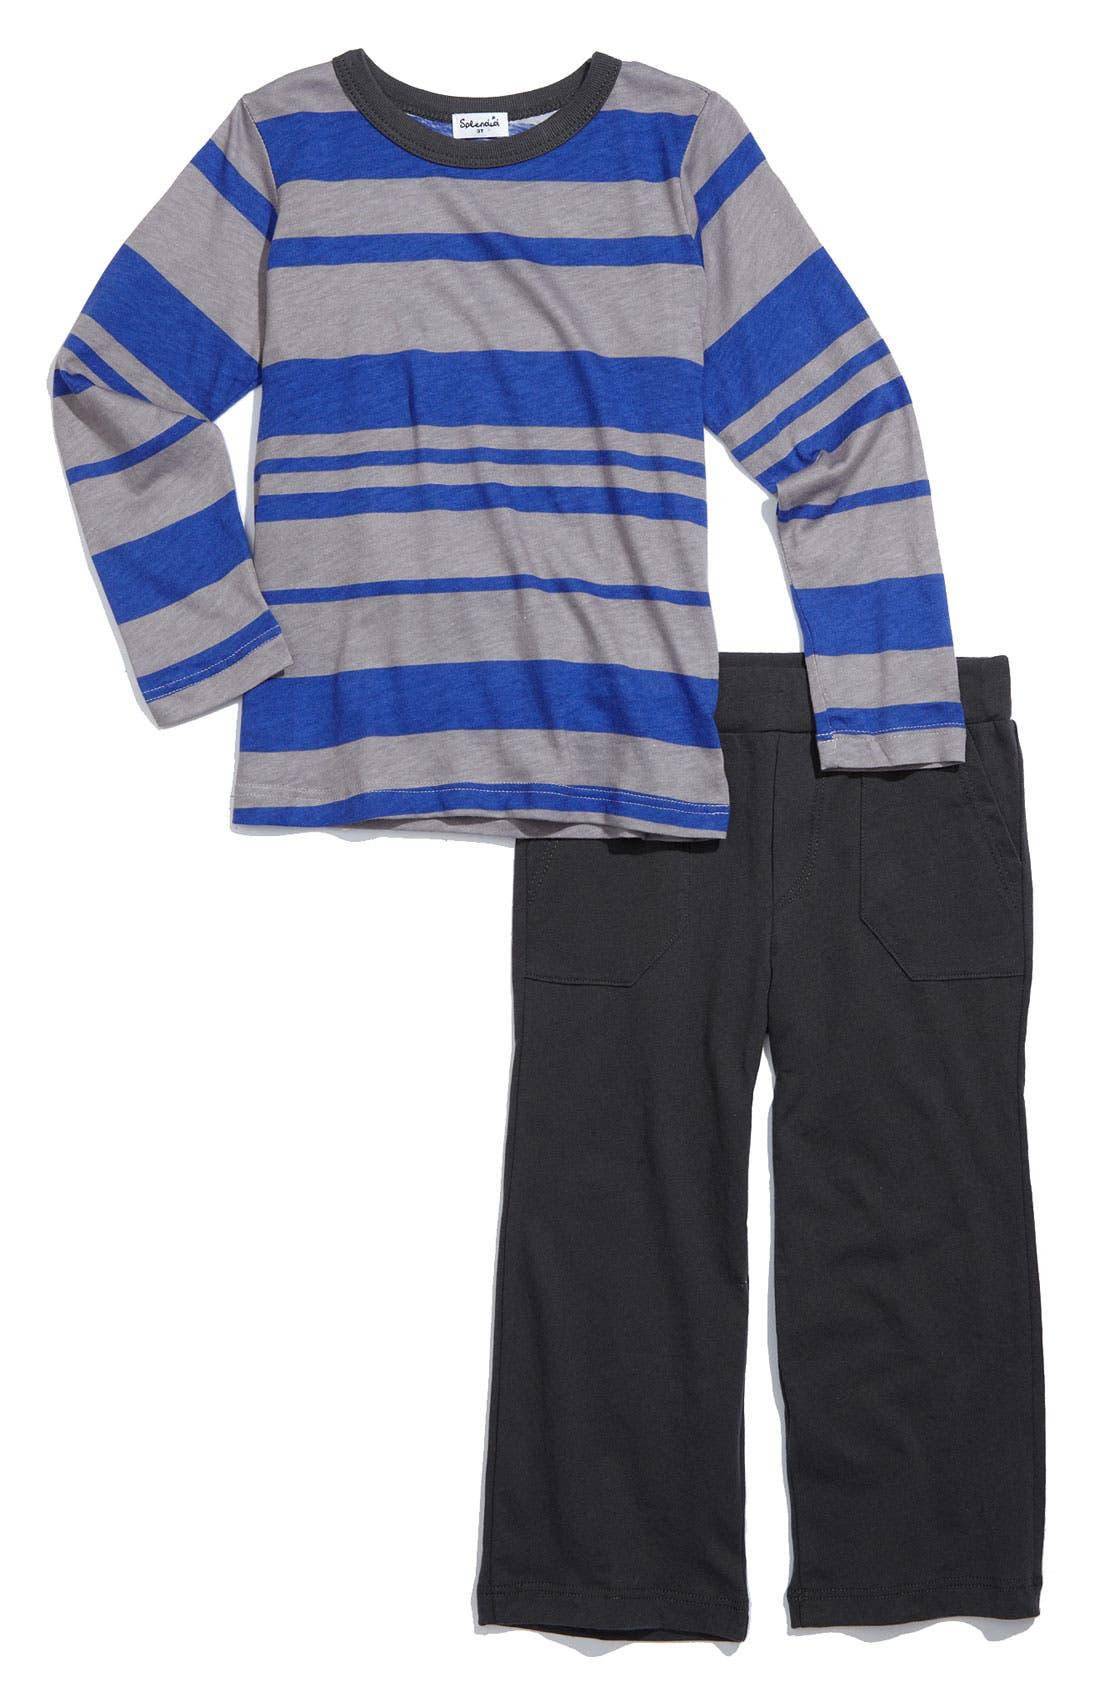 Main Image - Splendid 'Maritime Stripe' Shirt & Pants Set (Toddler)